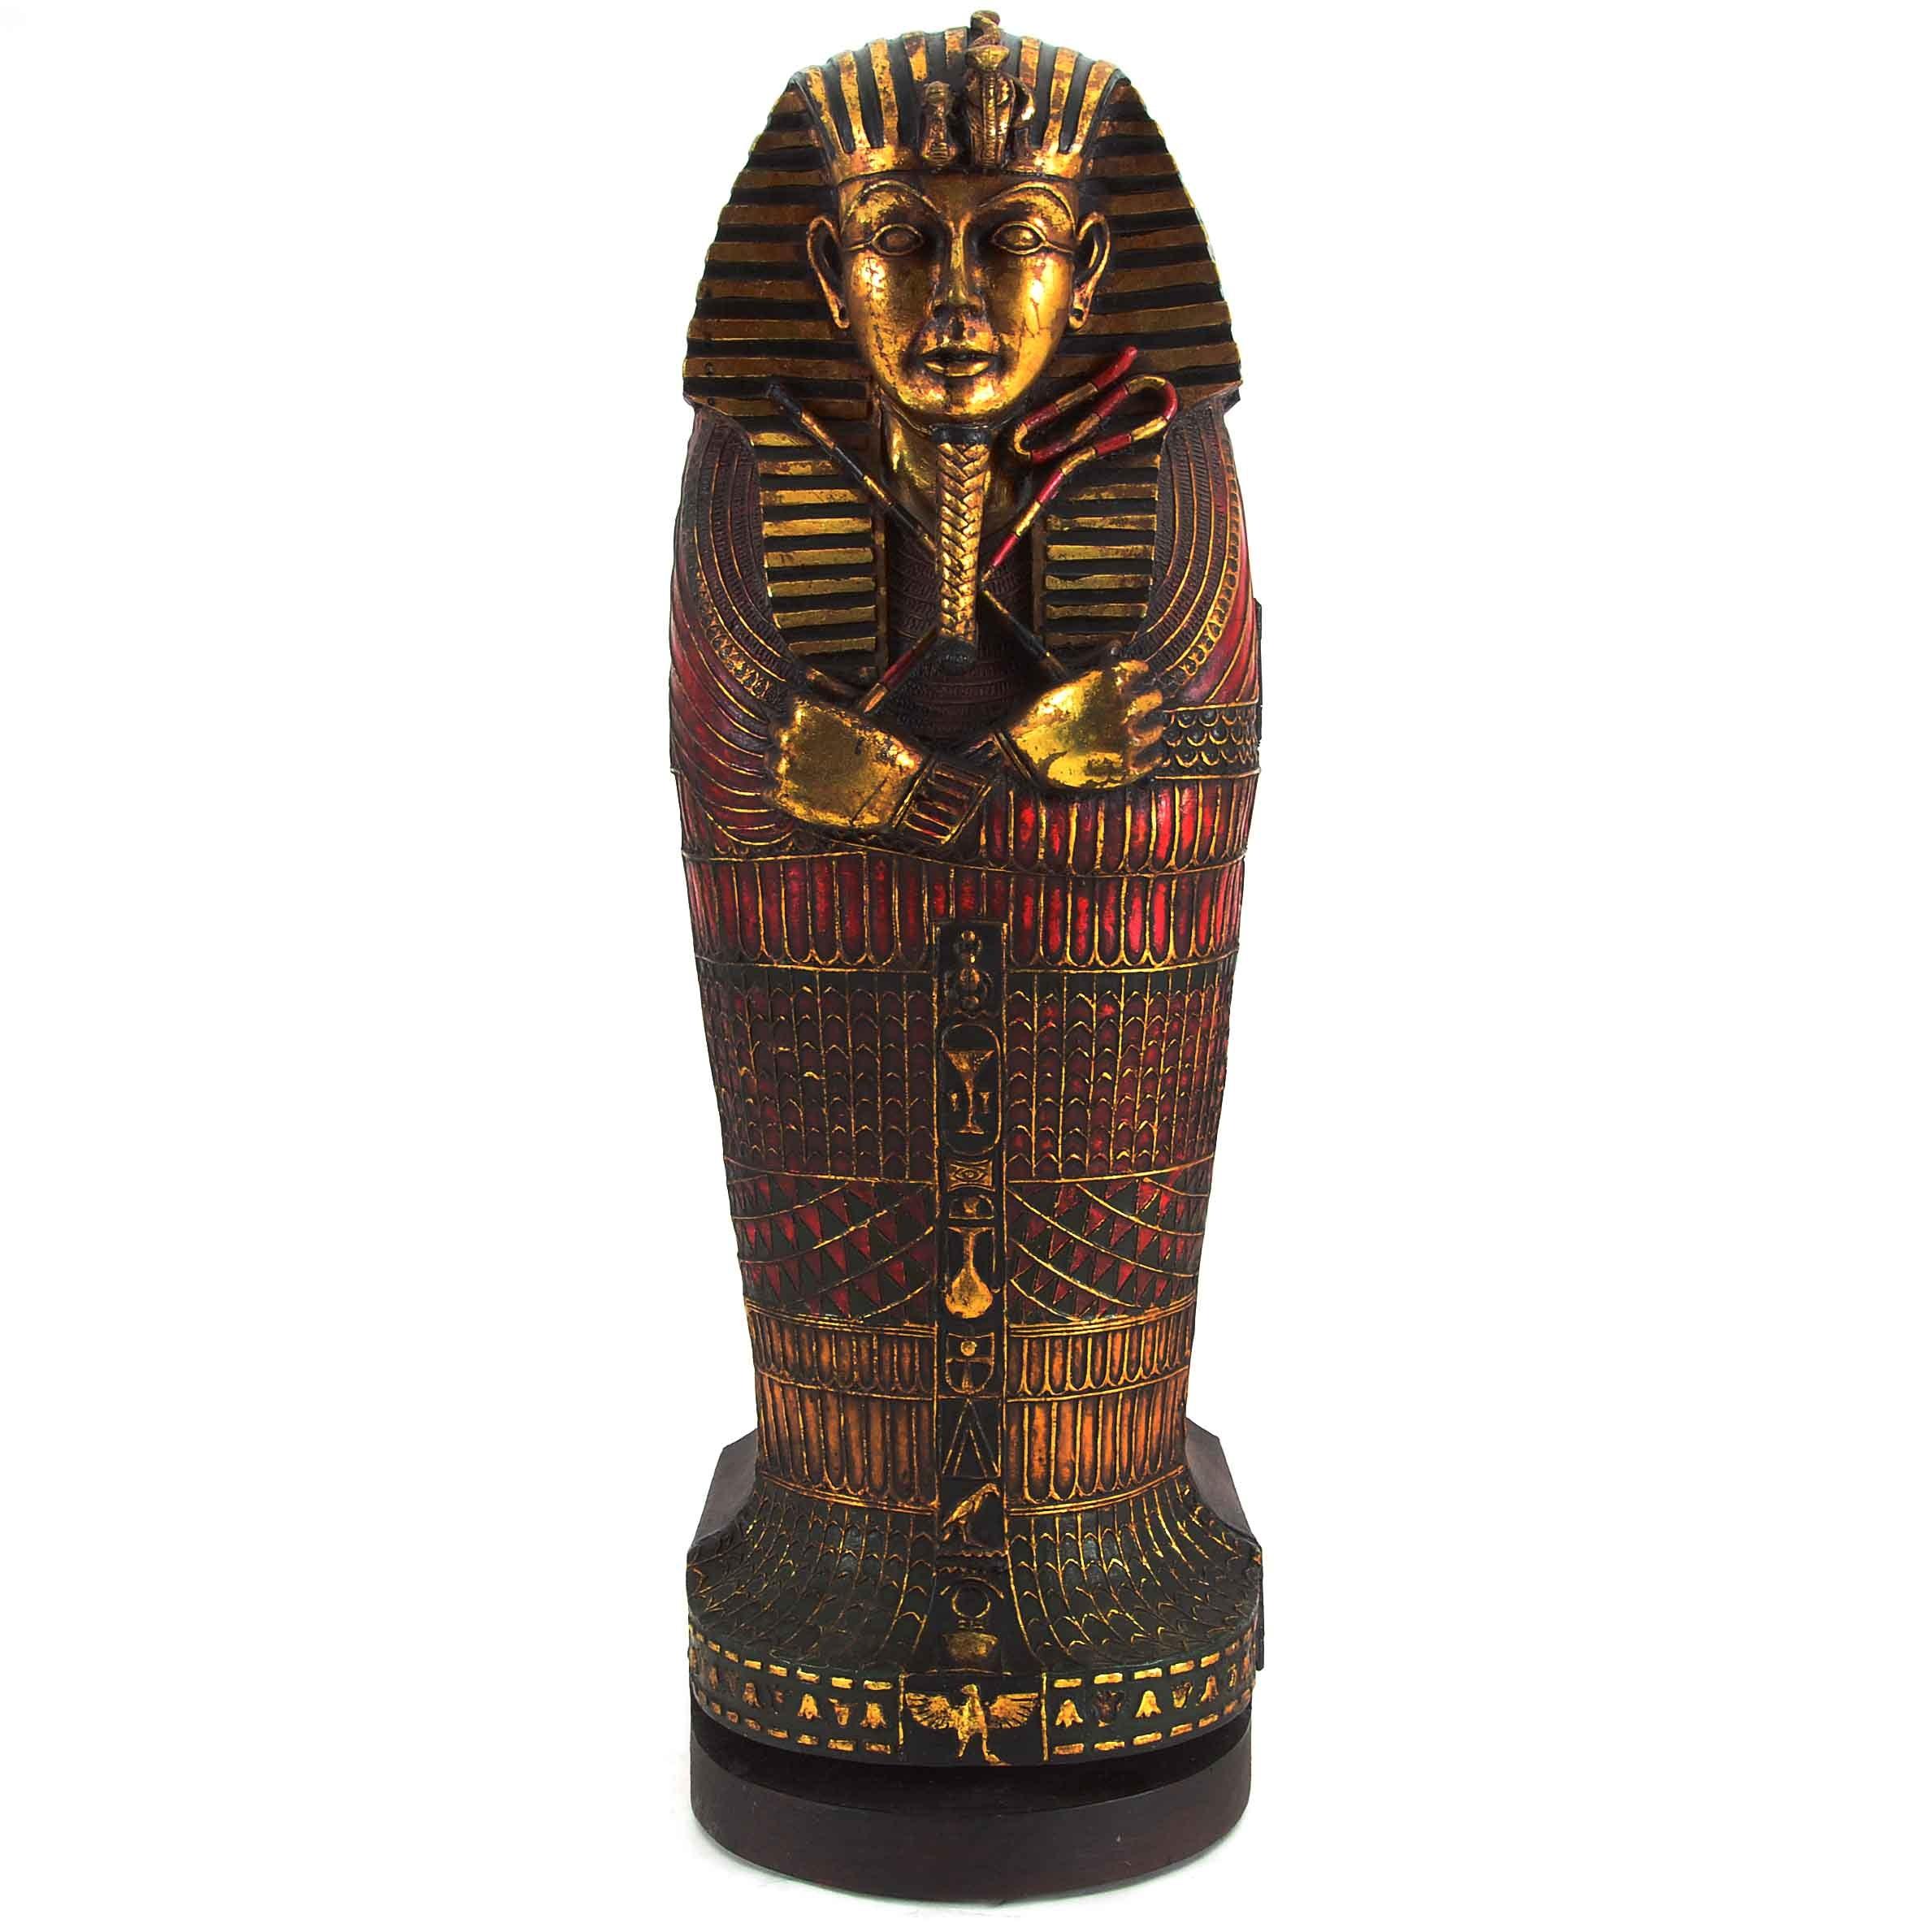 King Tutankhamen Sarcophagus Cabinet